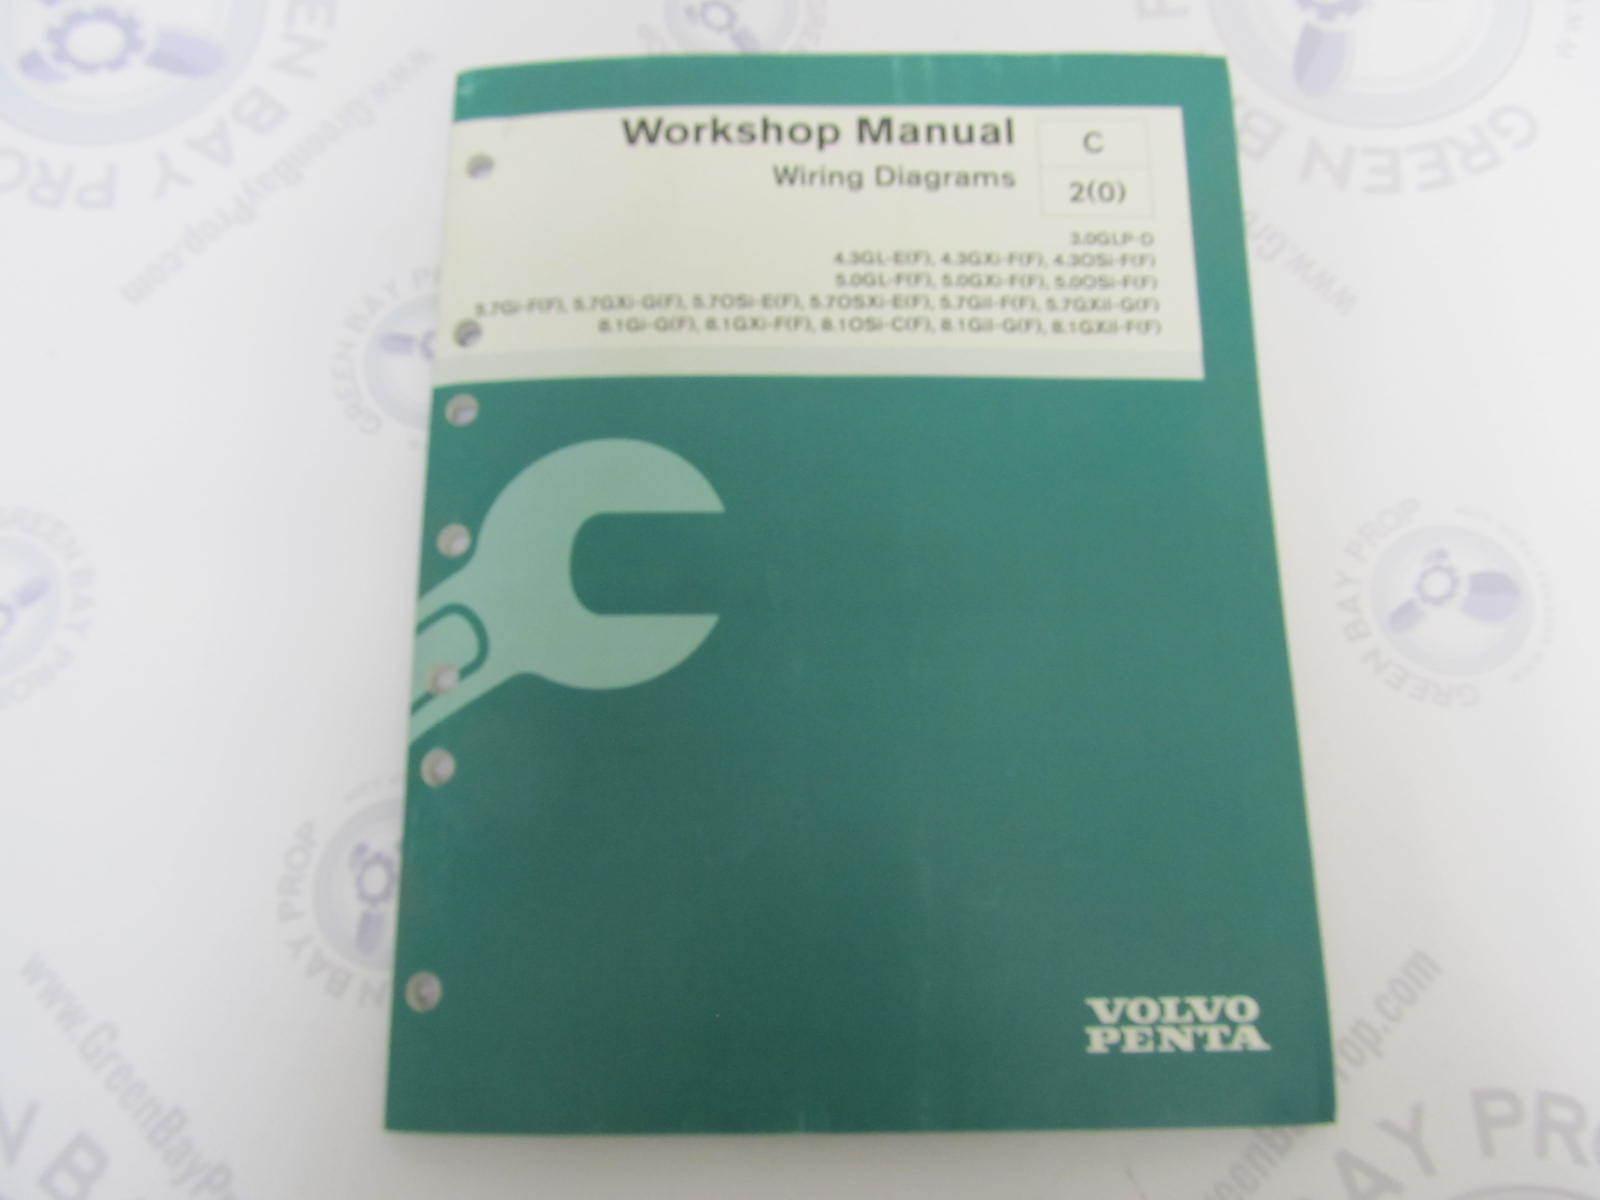 7745609 Volvo Penta Service Workshop Manual Wiring